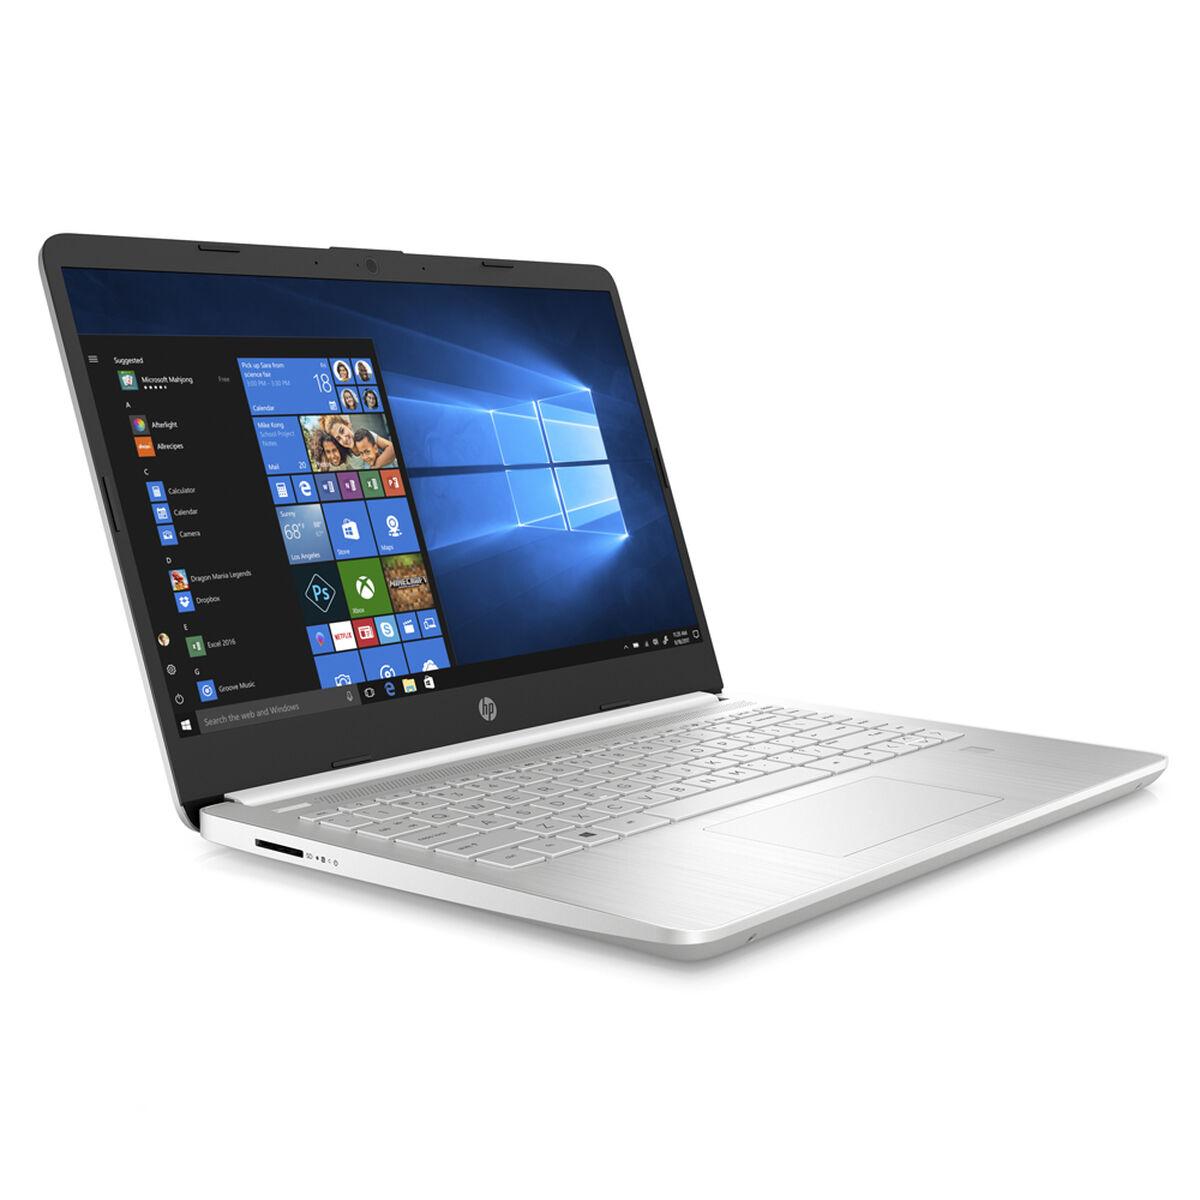 "Notebook HP 14-dq1003 Core i5 4GB 256GB SSD 14"" + 16GB Optane"